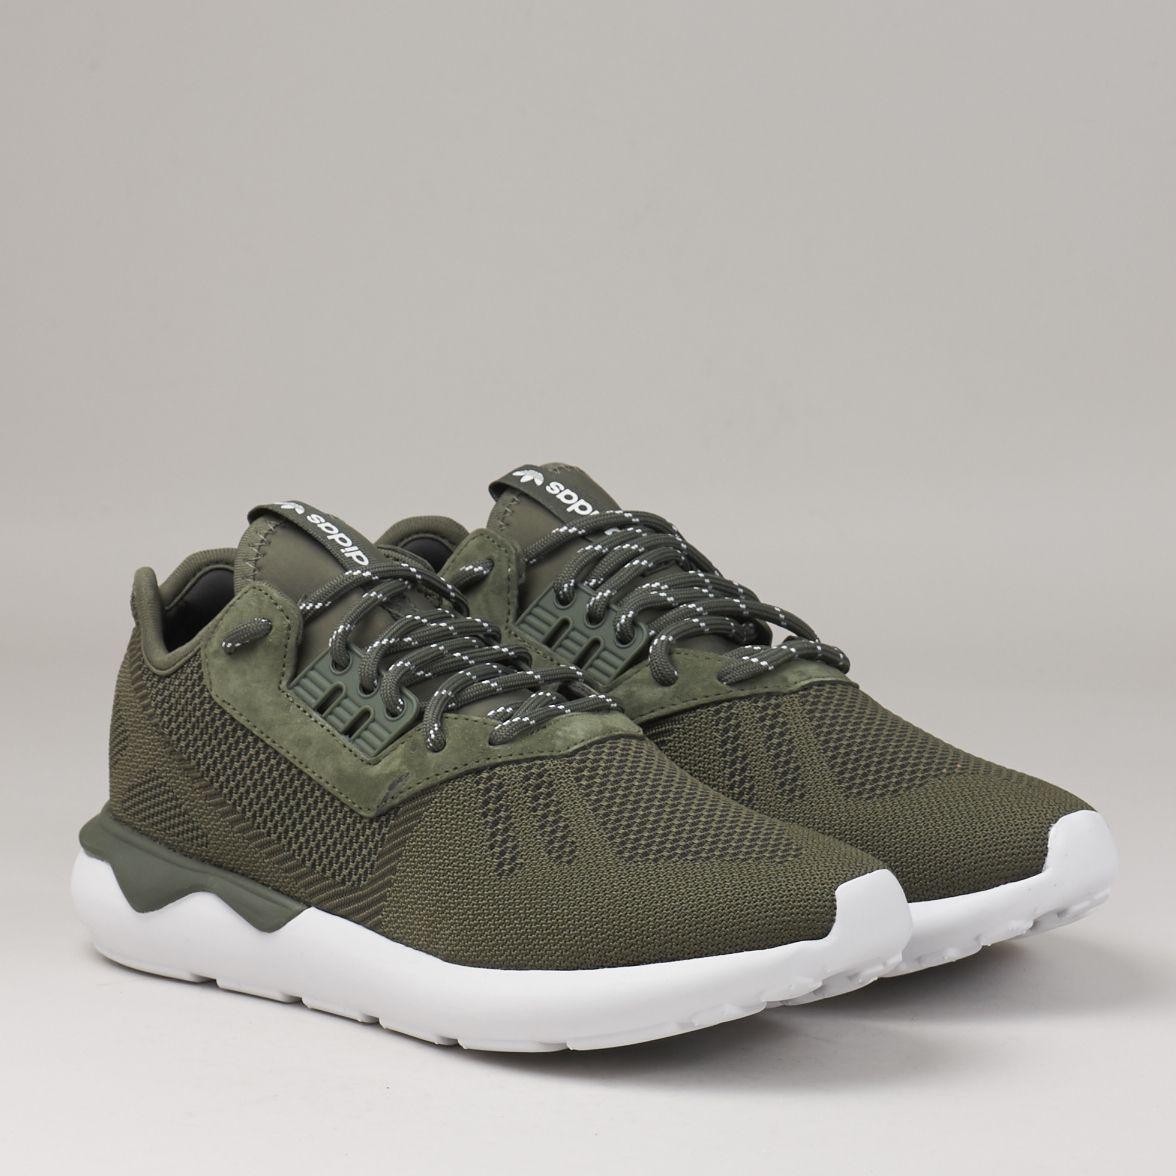 Adidas Tubular Runner Weave B25598 - Sneakers Herre - Hooha